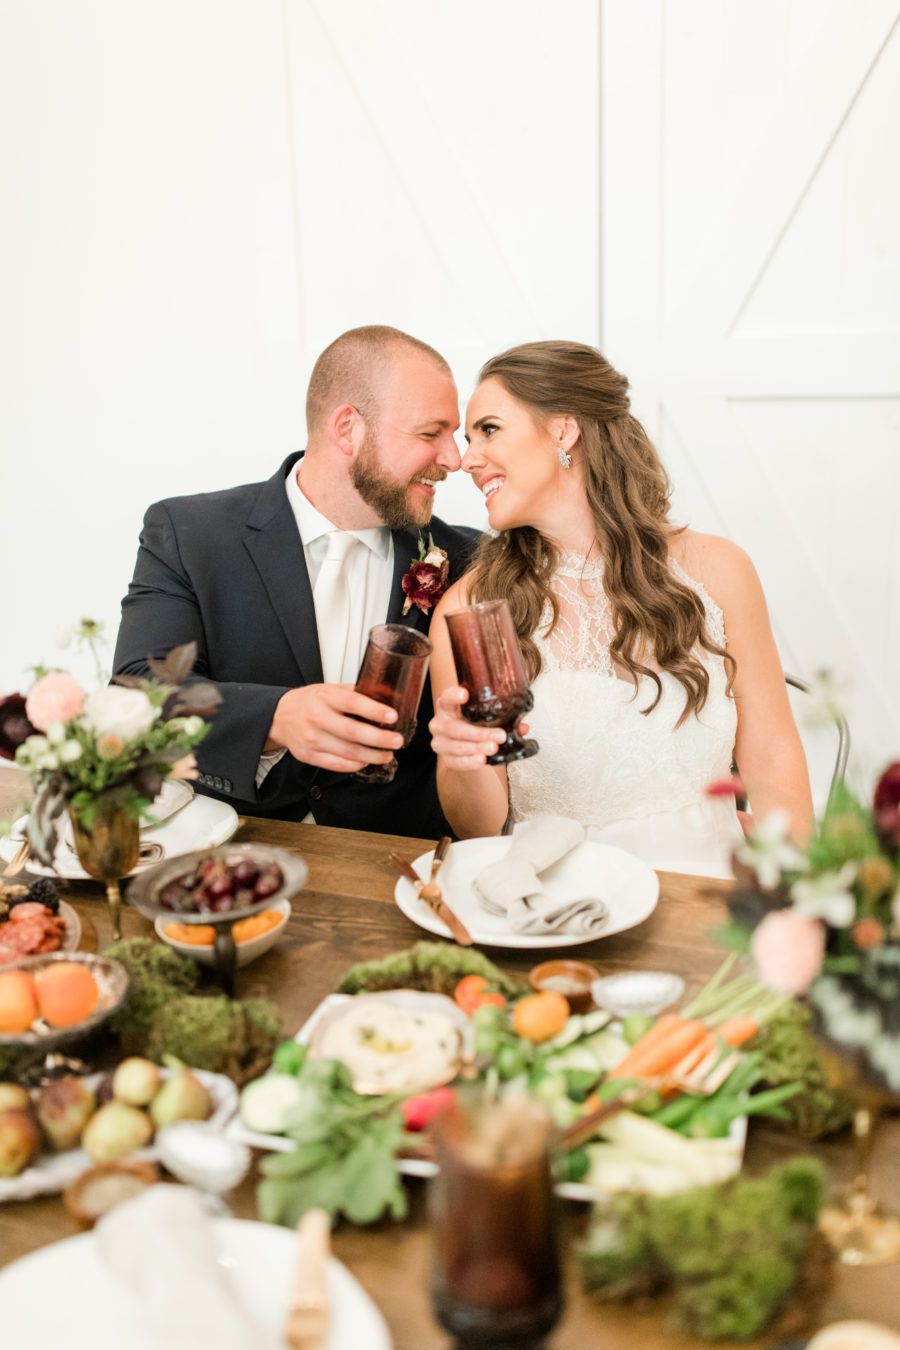 Nashville Wedding Photography: What Every Wedding Photographer Loves to Photograph